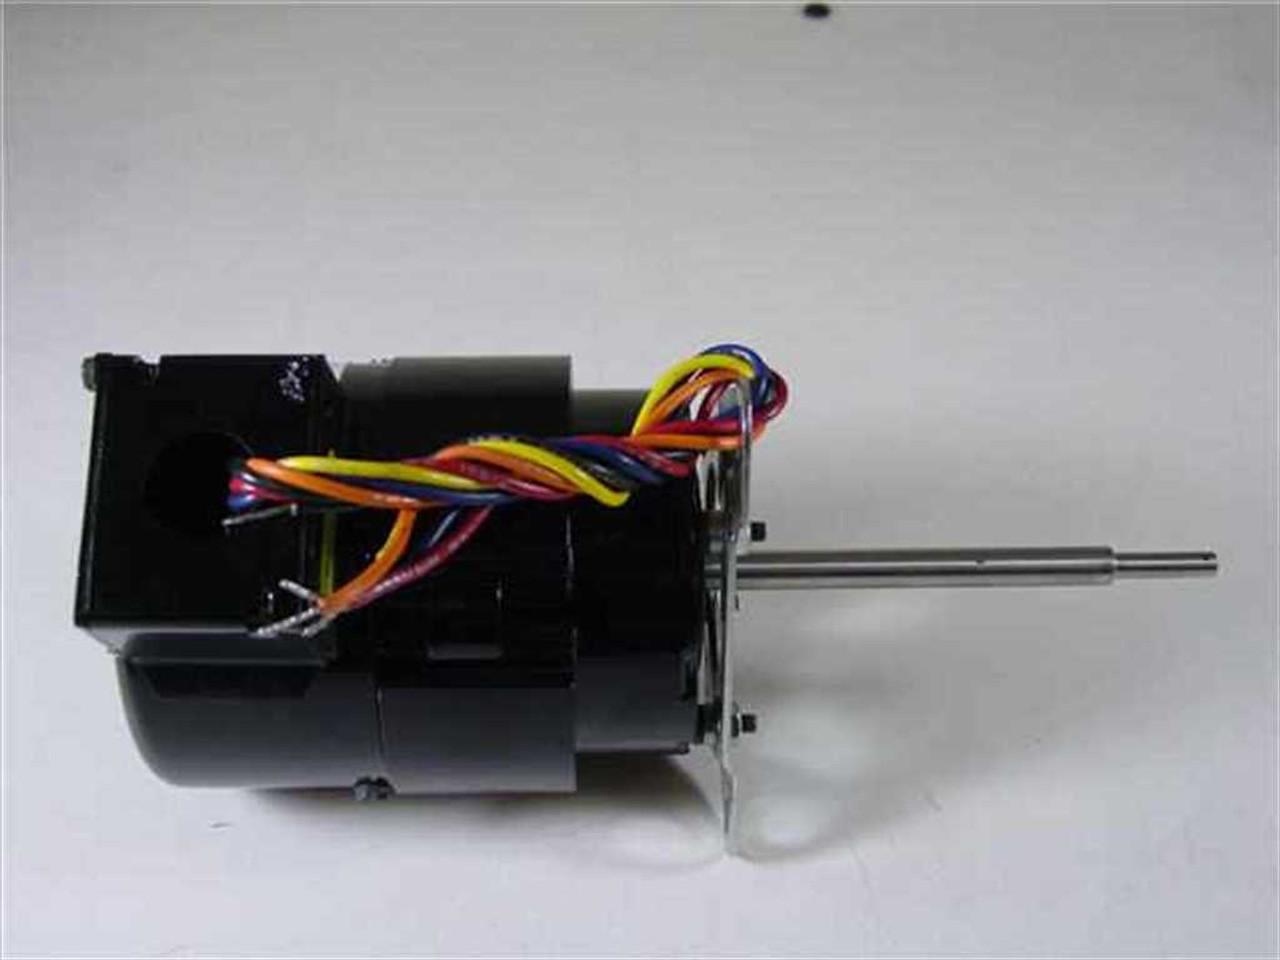 Magnetek JB1RO87N Universal Electric Motor | RecycledGoods.com on